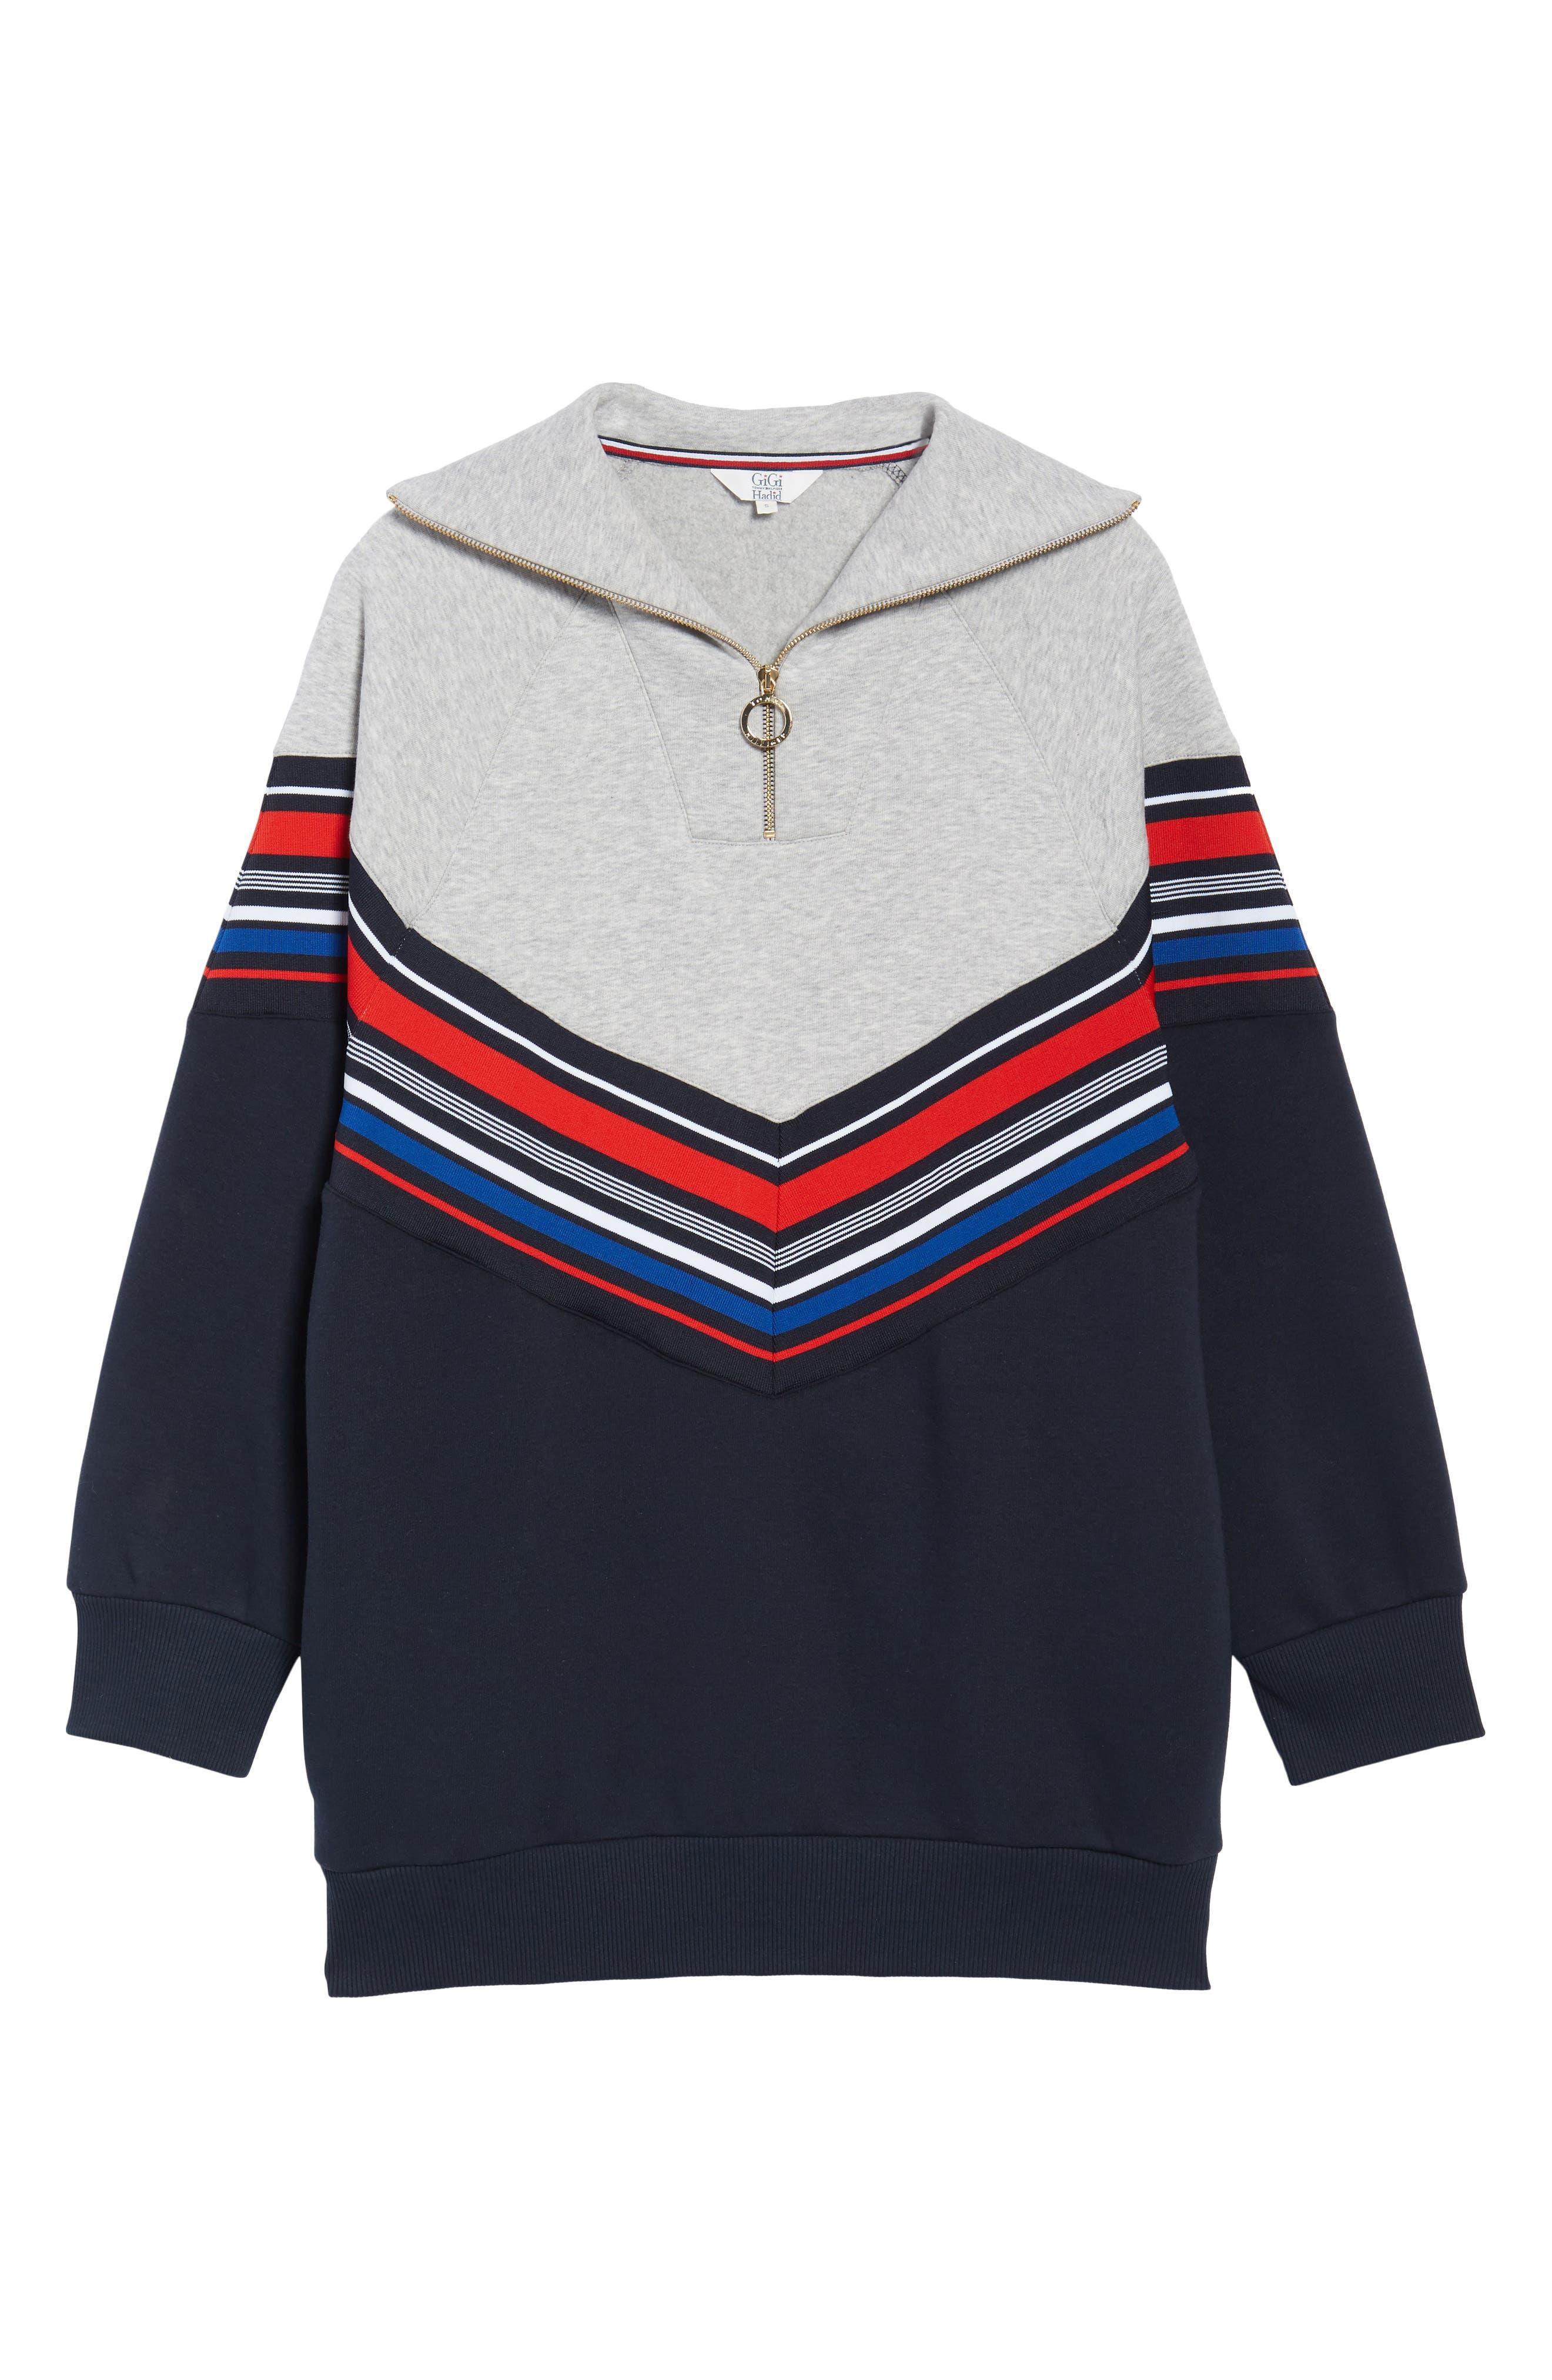 x Gigi Hadid Racing Sweatshirt Dress,                             Alternate thumbnail 6, color,                             Midnight/ Hthr